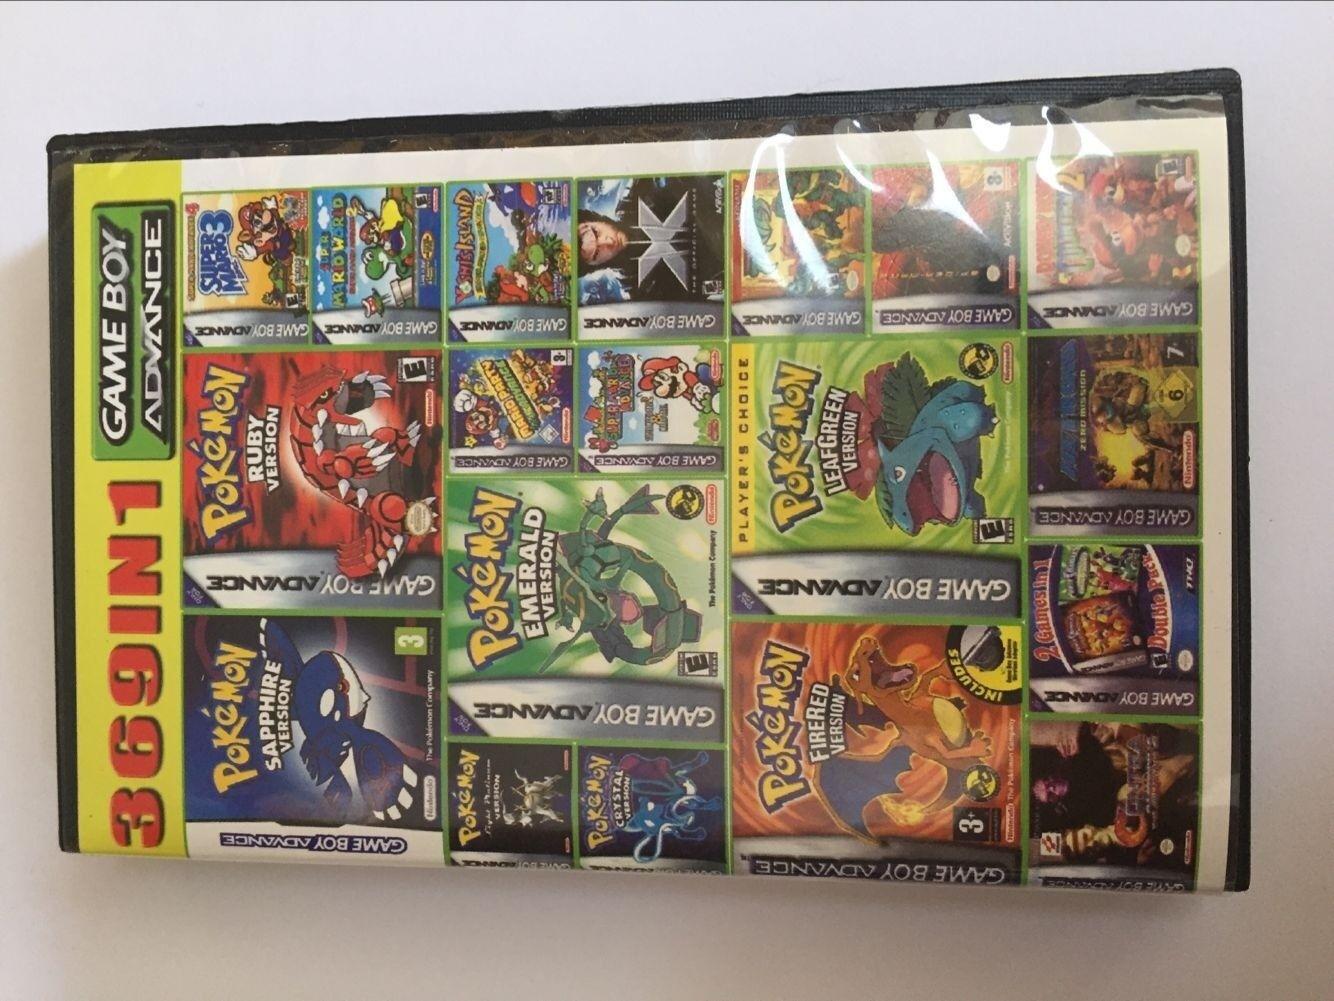 369 in 1 Multicart GBA Game Boy Advance SP Pokemen Marioo DK Collection CA 2